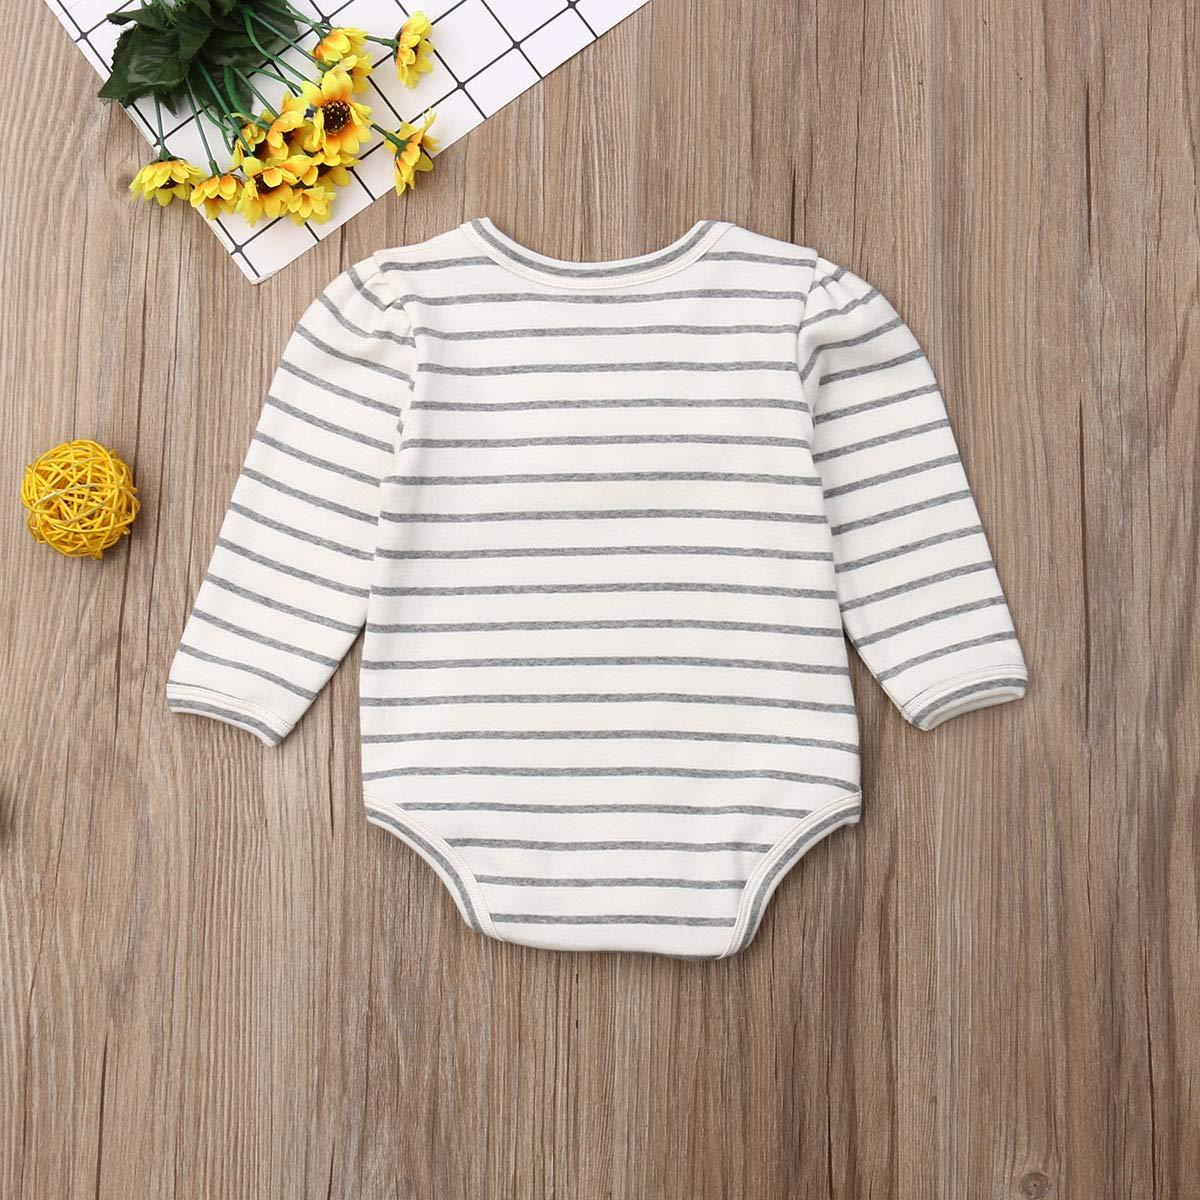 Baby Girls Boys Long Sleeve Cotton Bodysuit Pocket Autumn//Winter Romper Jumpsuit Tops Summer Spring Clothes